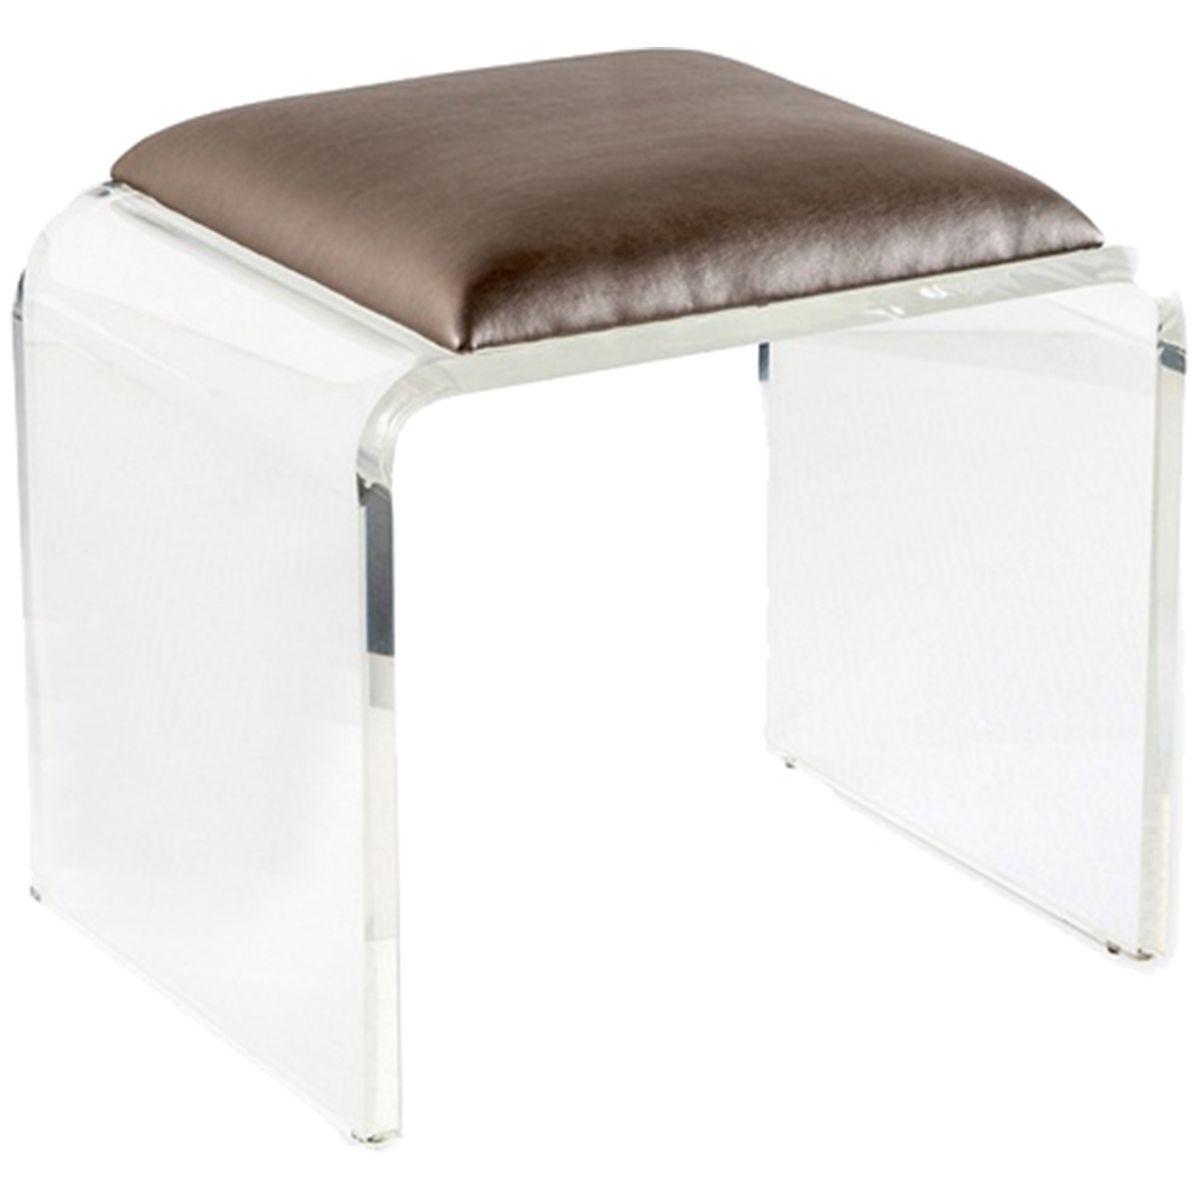 Interlude home mira acrylic stool interlude home pinterest interlude home mira acrylic stool clear acrylicconsole tablesmaster geotapseo Gallery